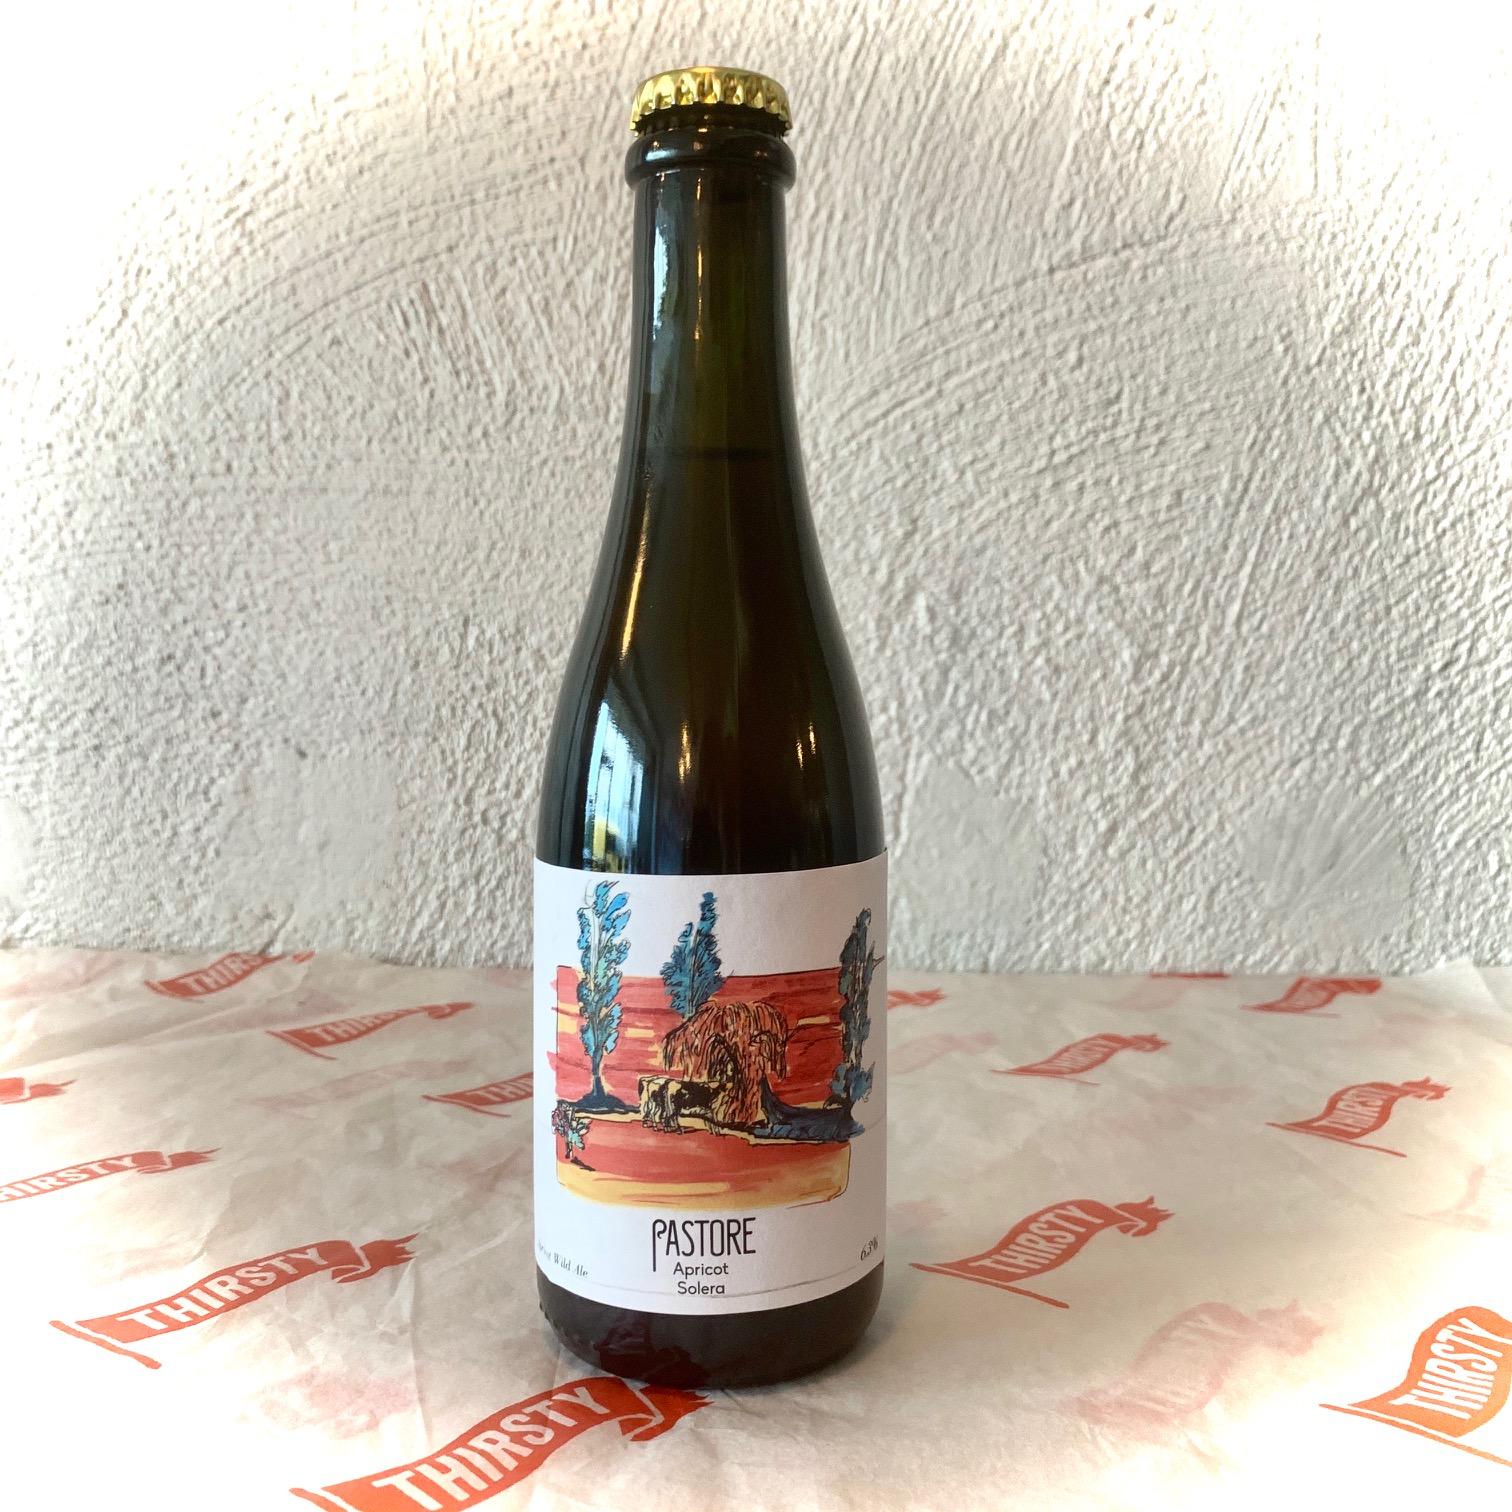 Pastore | Apricot Solera | Wild Ale with Spanish Apricots 6.3% 375ml